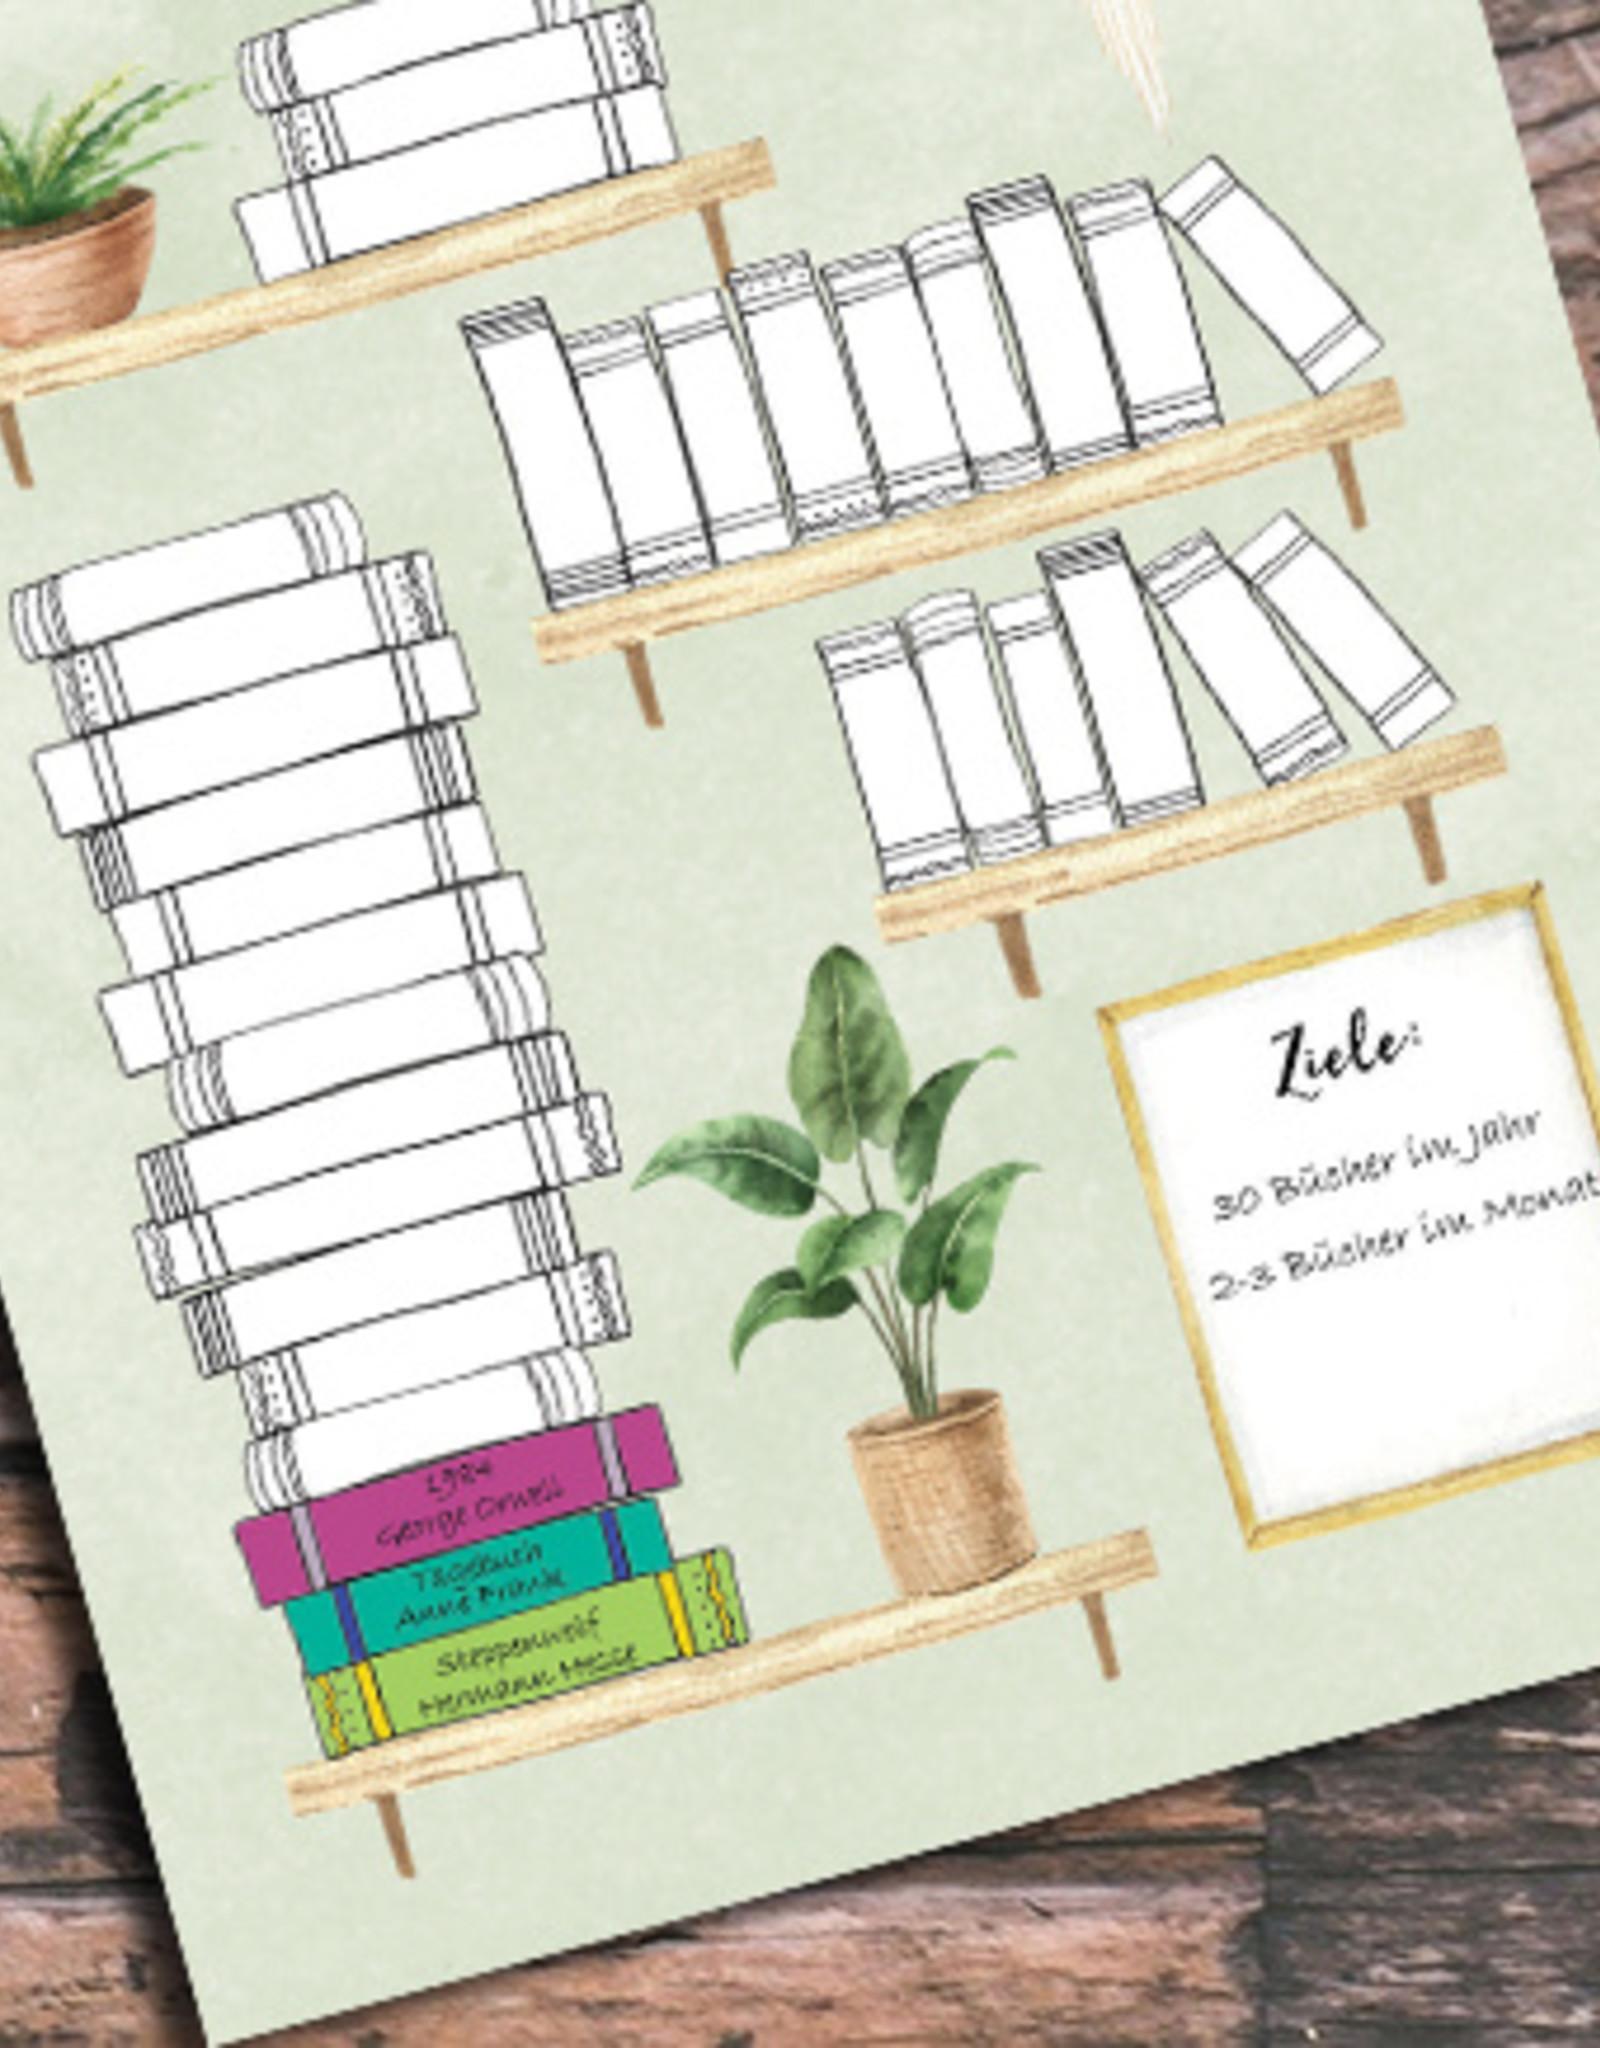 Postkarte BÜCHER Bullet Journal Postkarte Bücherliste Checkliste Bücher lesen Leseliste